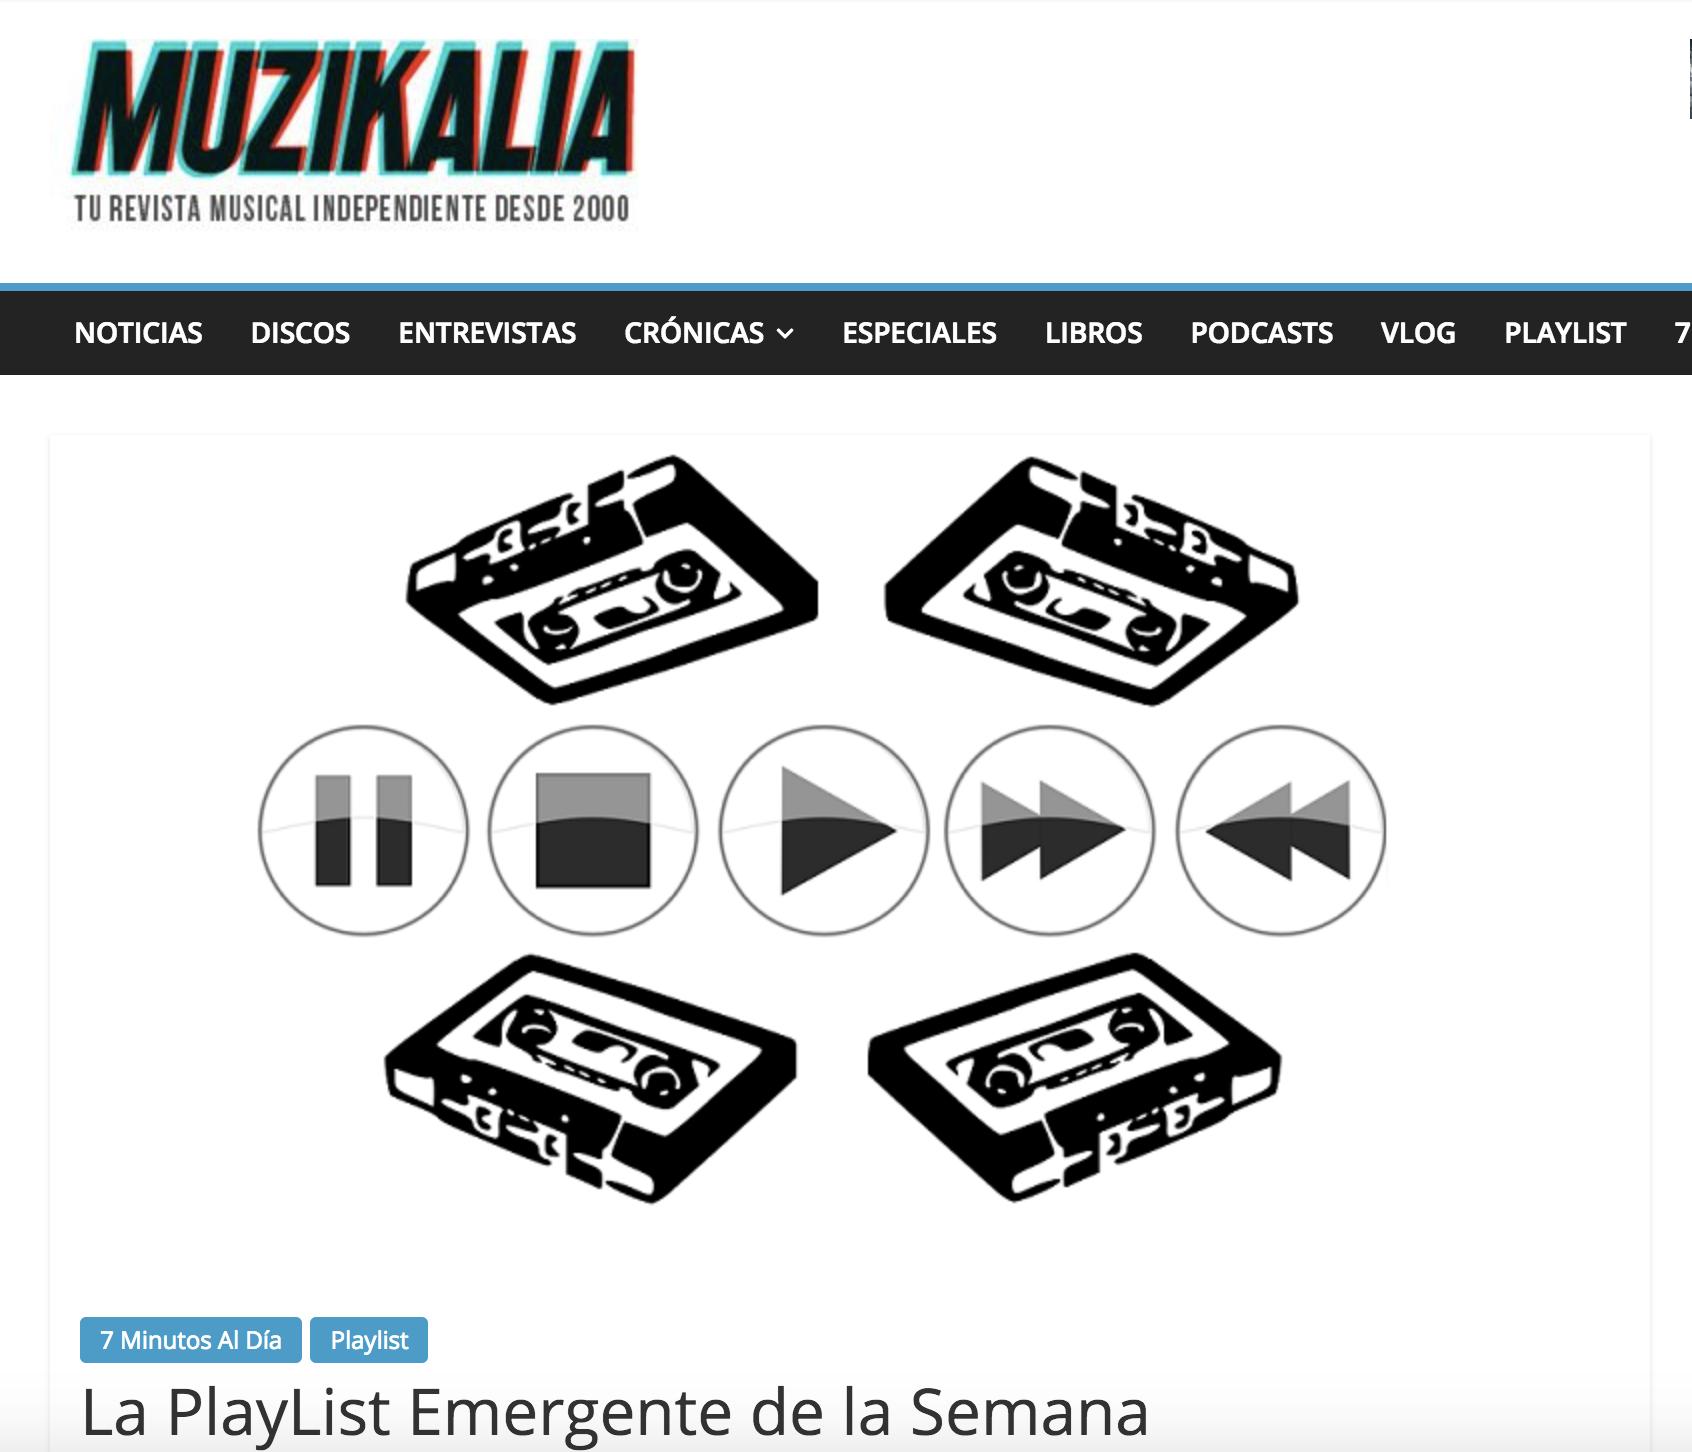 Musikalia 2